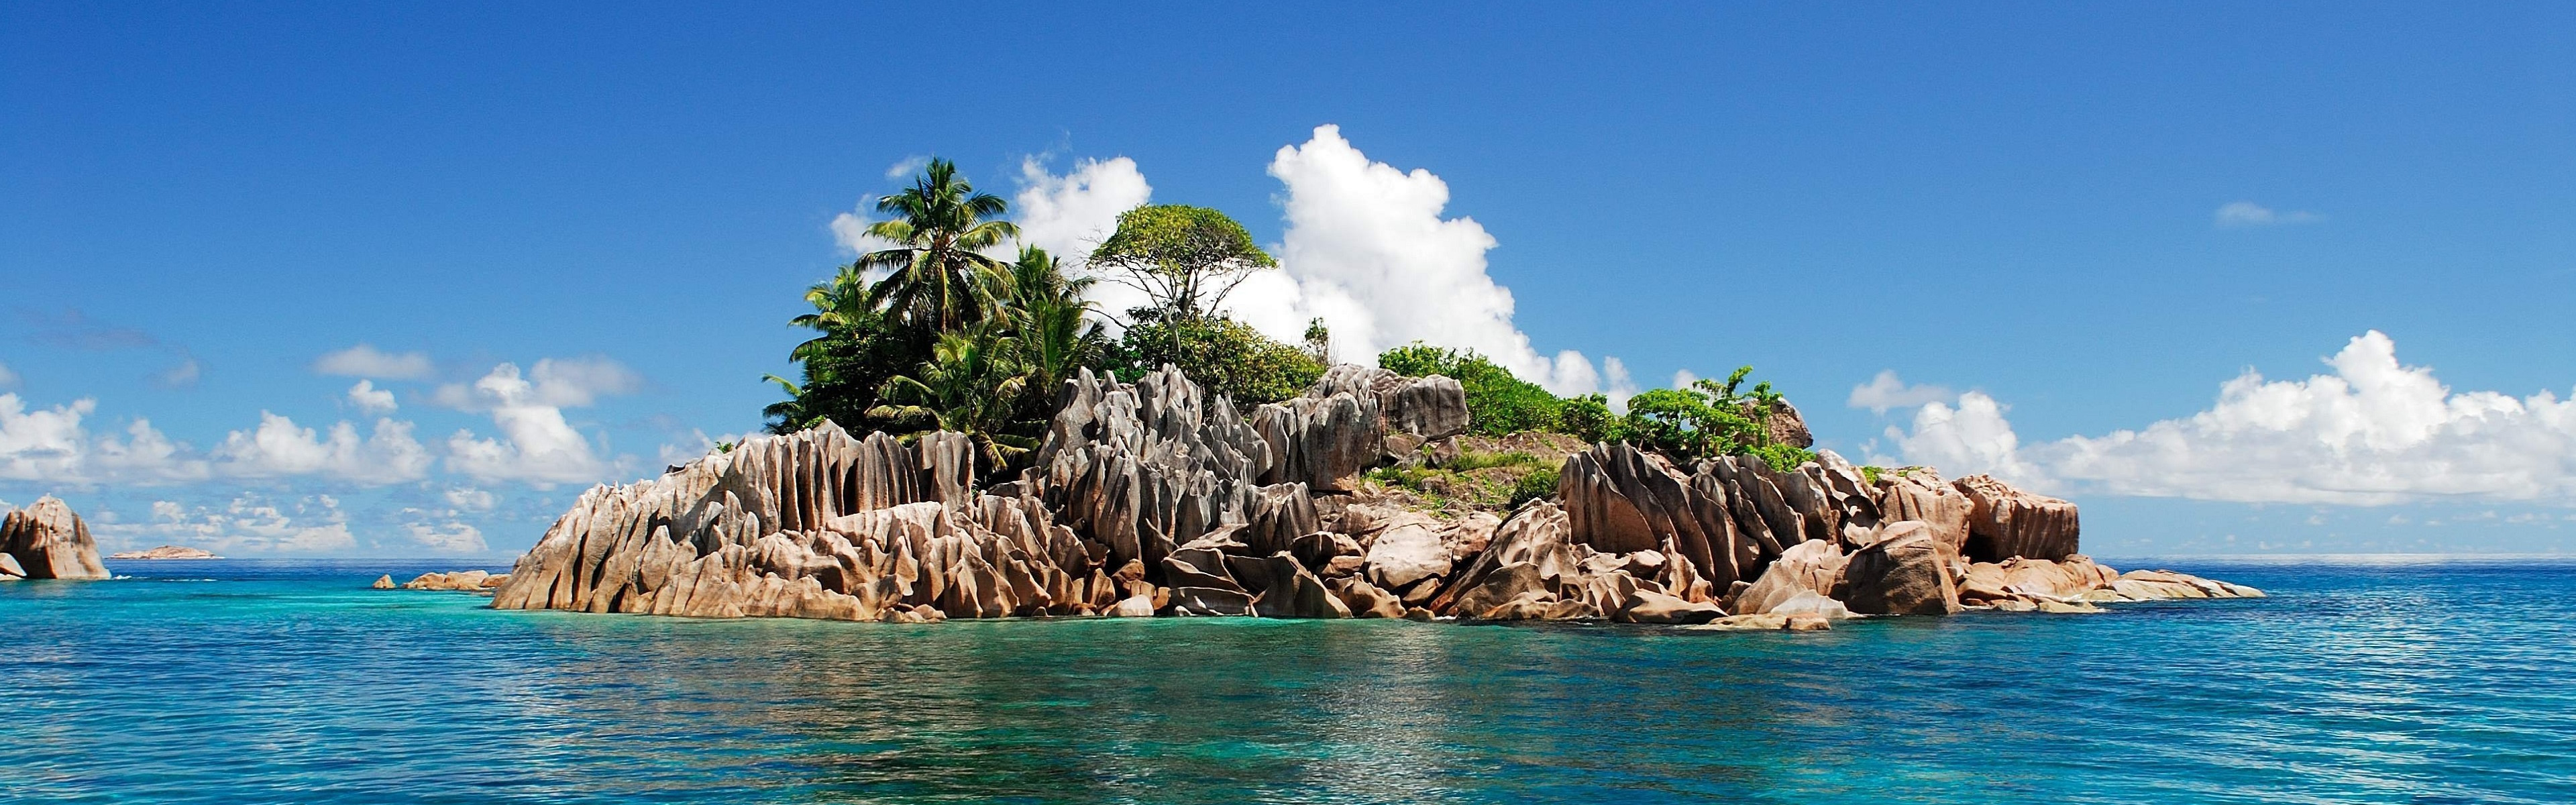 wallpaper.wiki-Island-Panoramic-Image-PIC-WPD001354